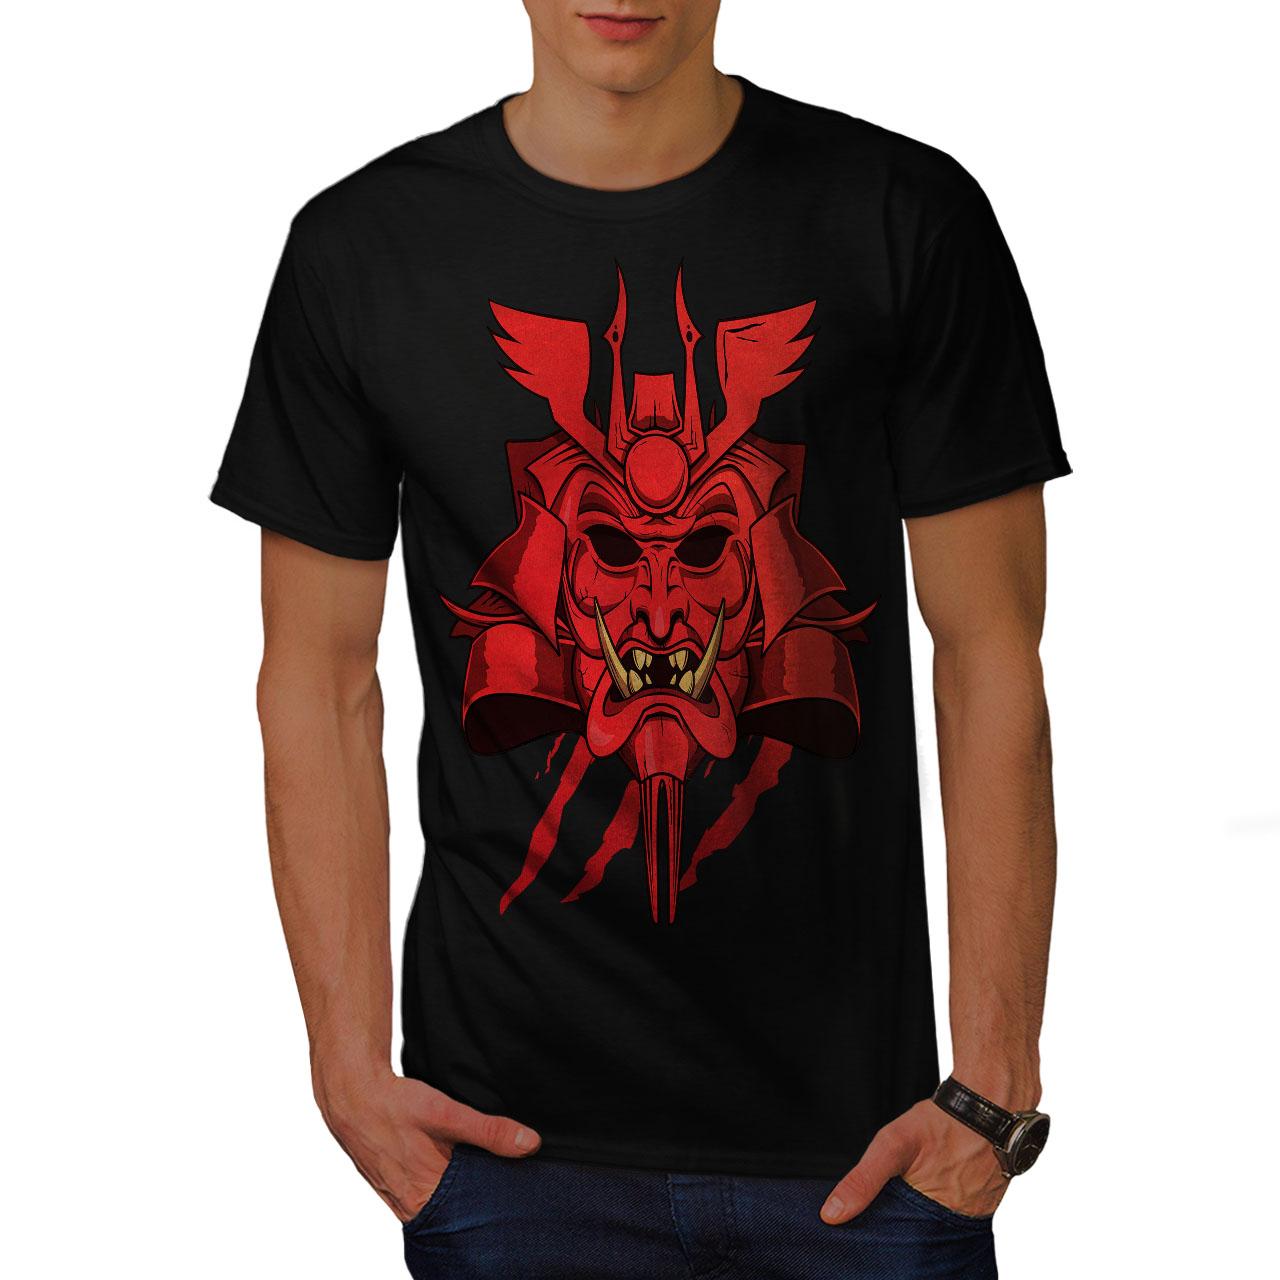 T Shirt Japanese Design | Wellcoda Japanese Oni Mask Mens T Shirt Japan Graphic Design